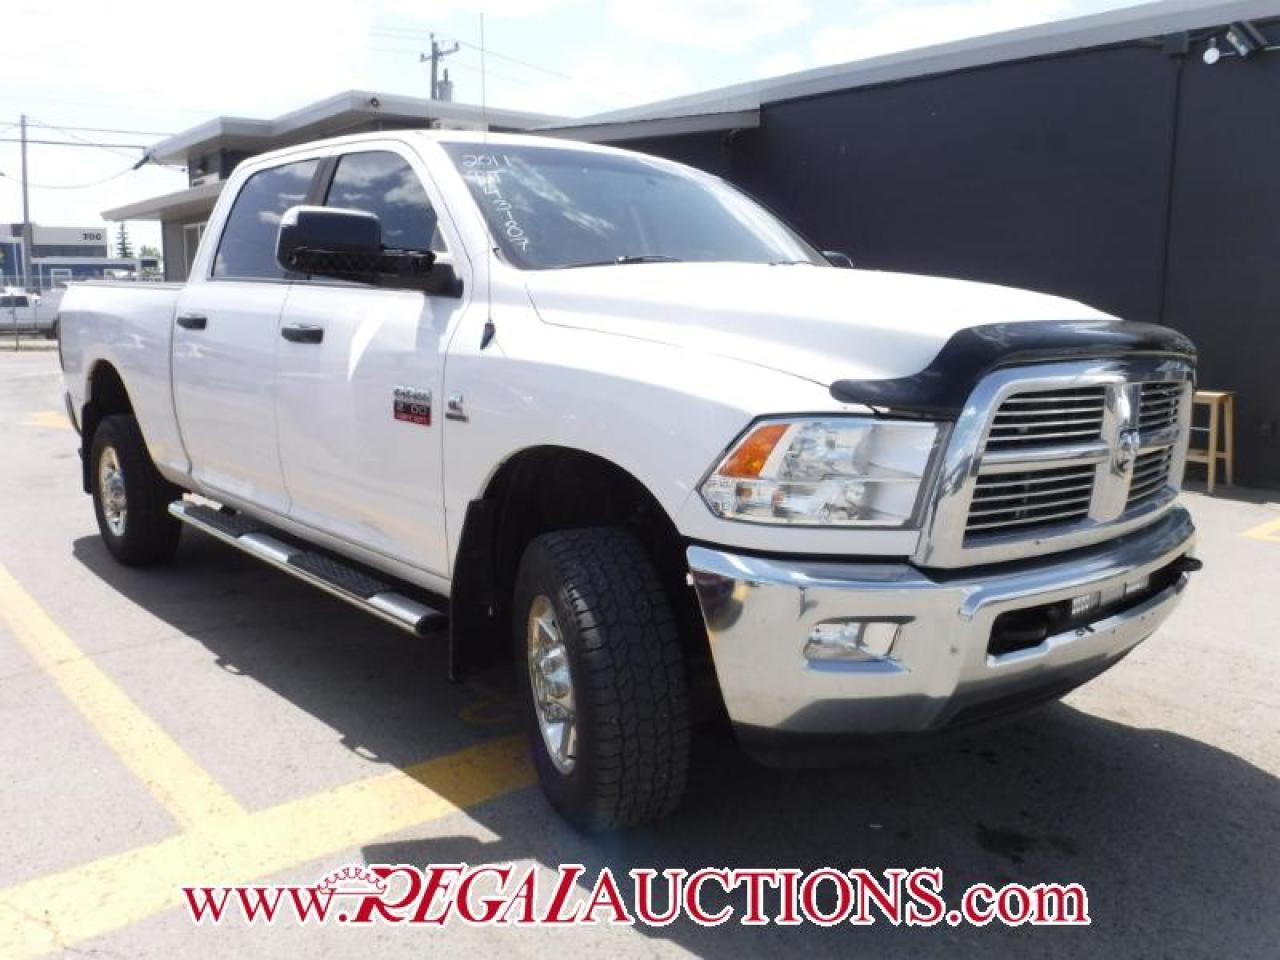 Photo of White 2011 Dodge RAM 2500 SLT CREW CAB